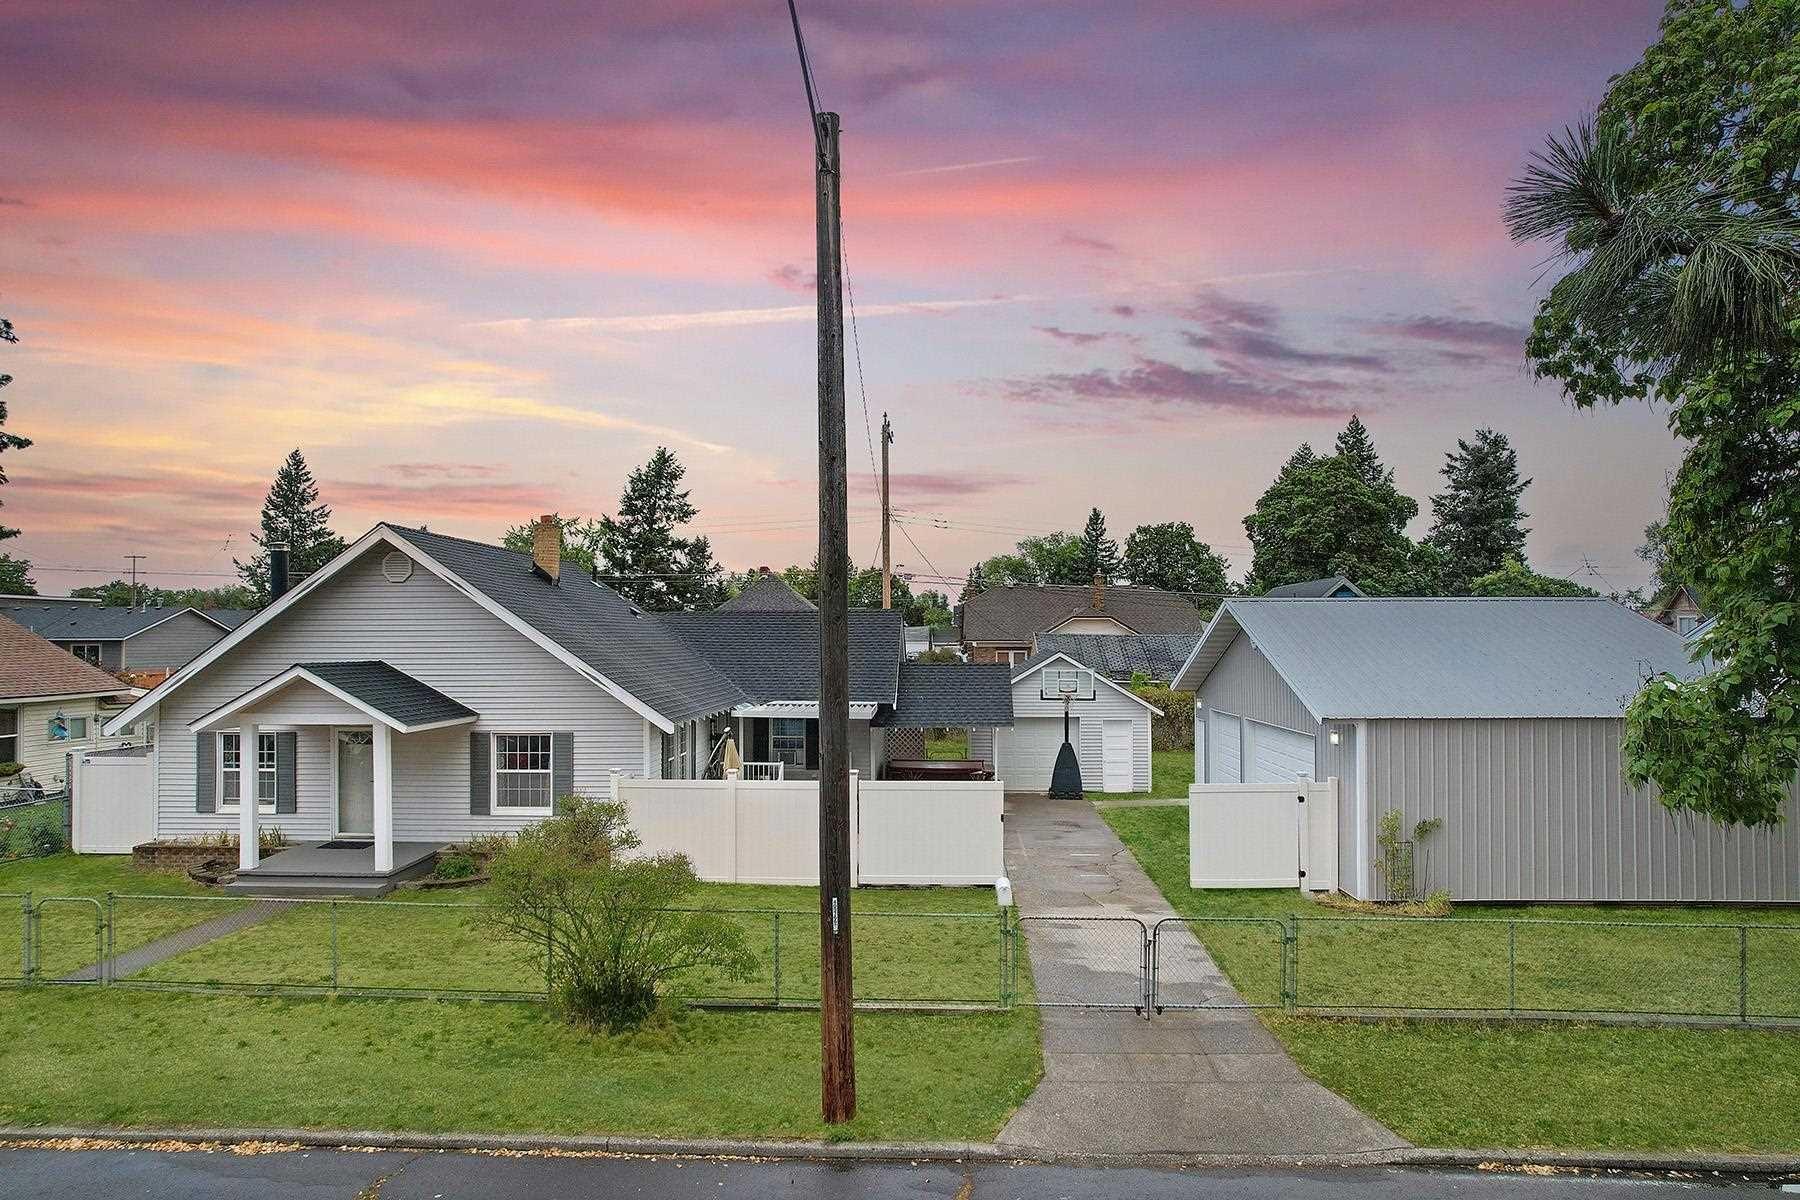 627 E Hoffman Ave, Spokane, WA 99207 - #: 202119378